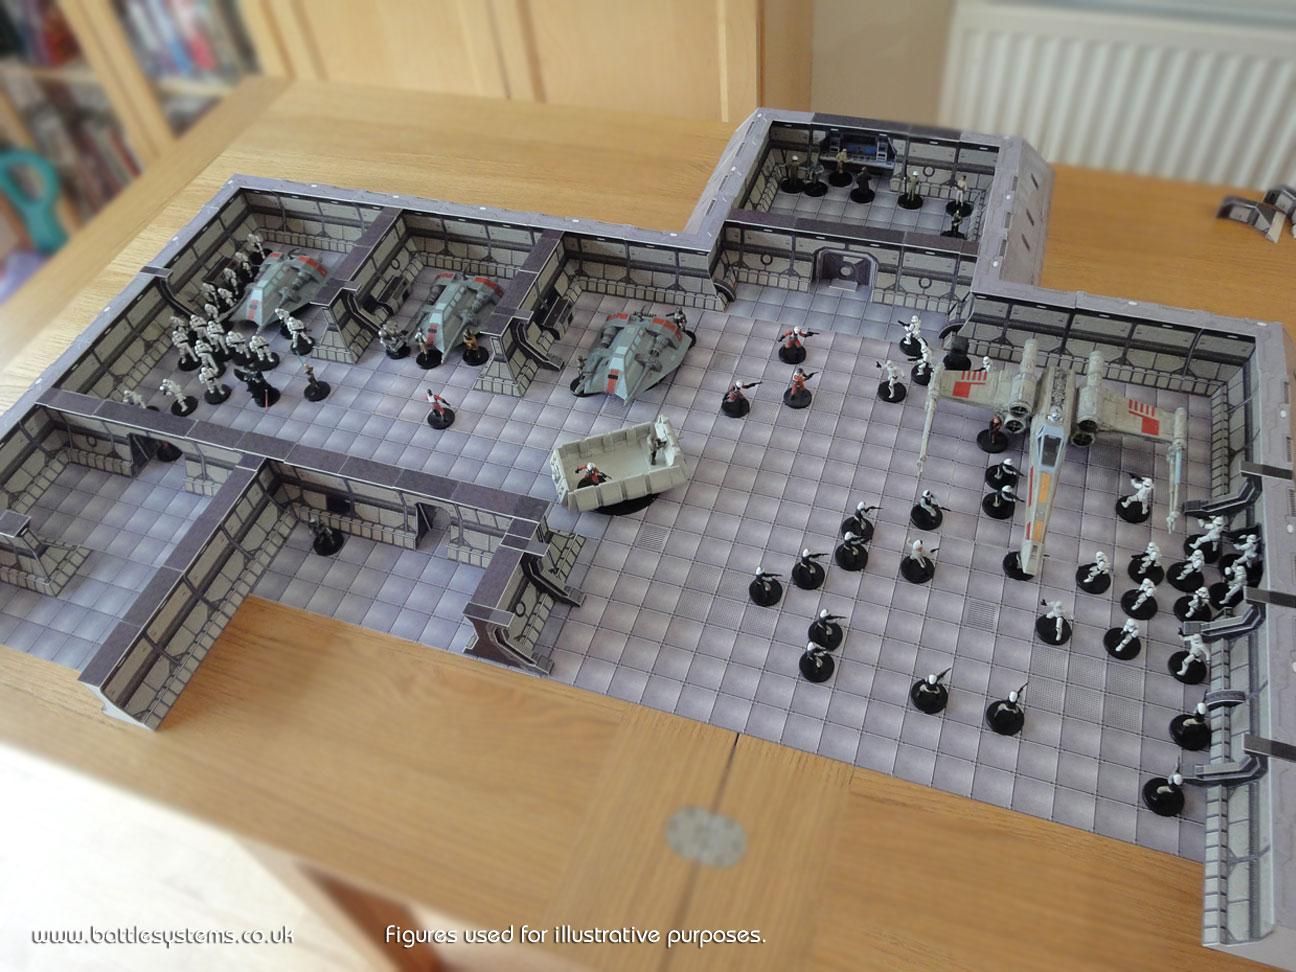 battle systems neues bunkergel nde br ckenkopf online. Black Bedroom Furniture Sets. Home Design Ideas